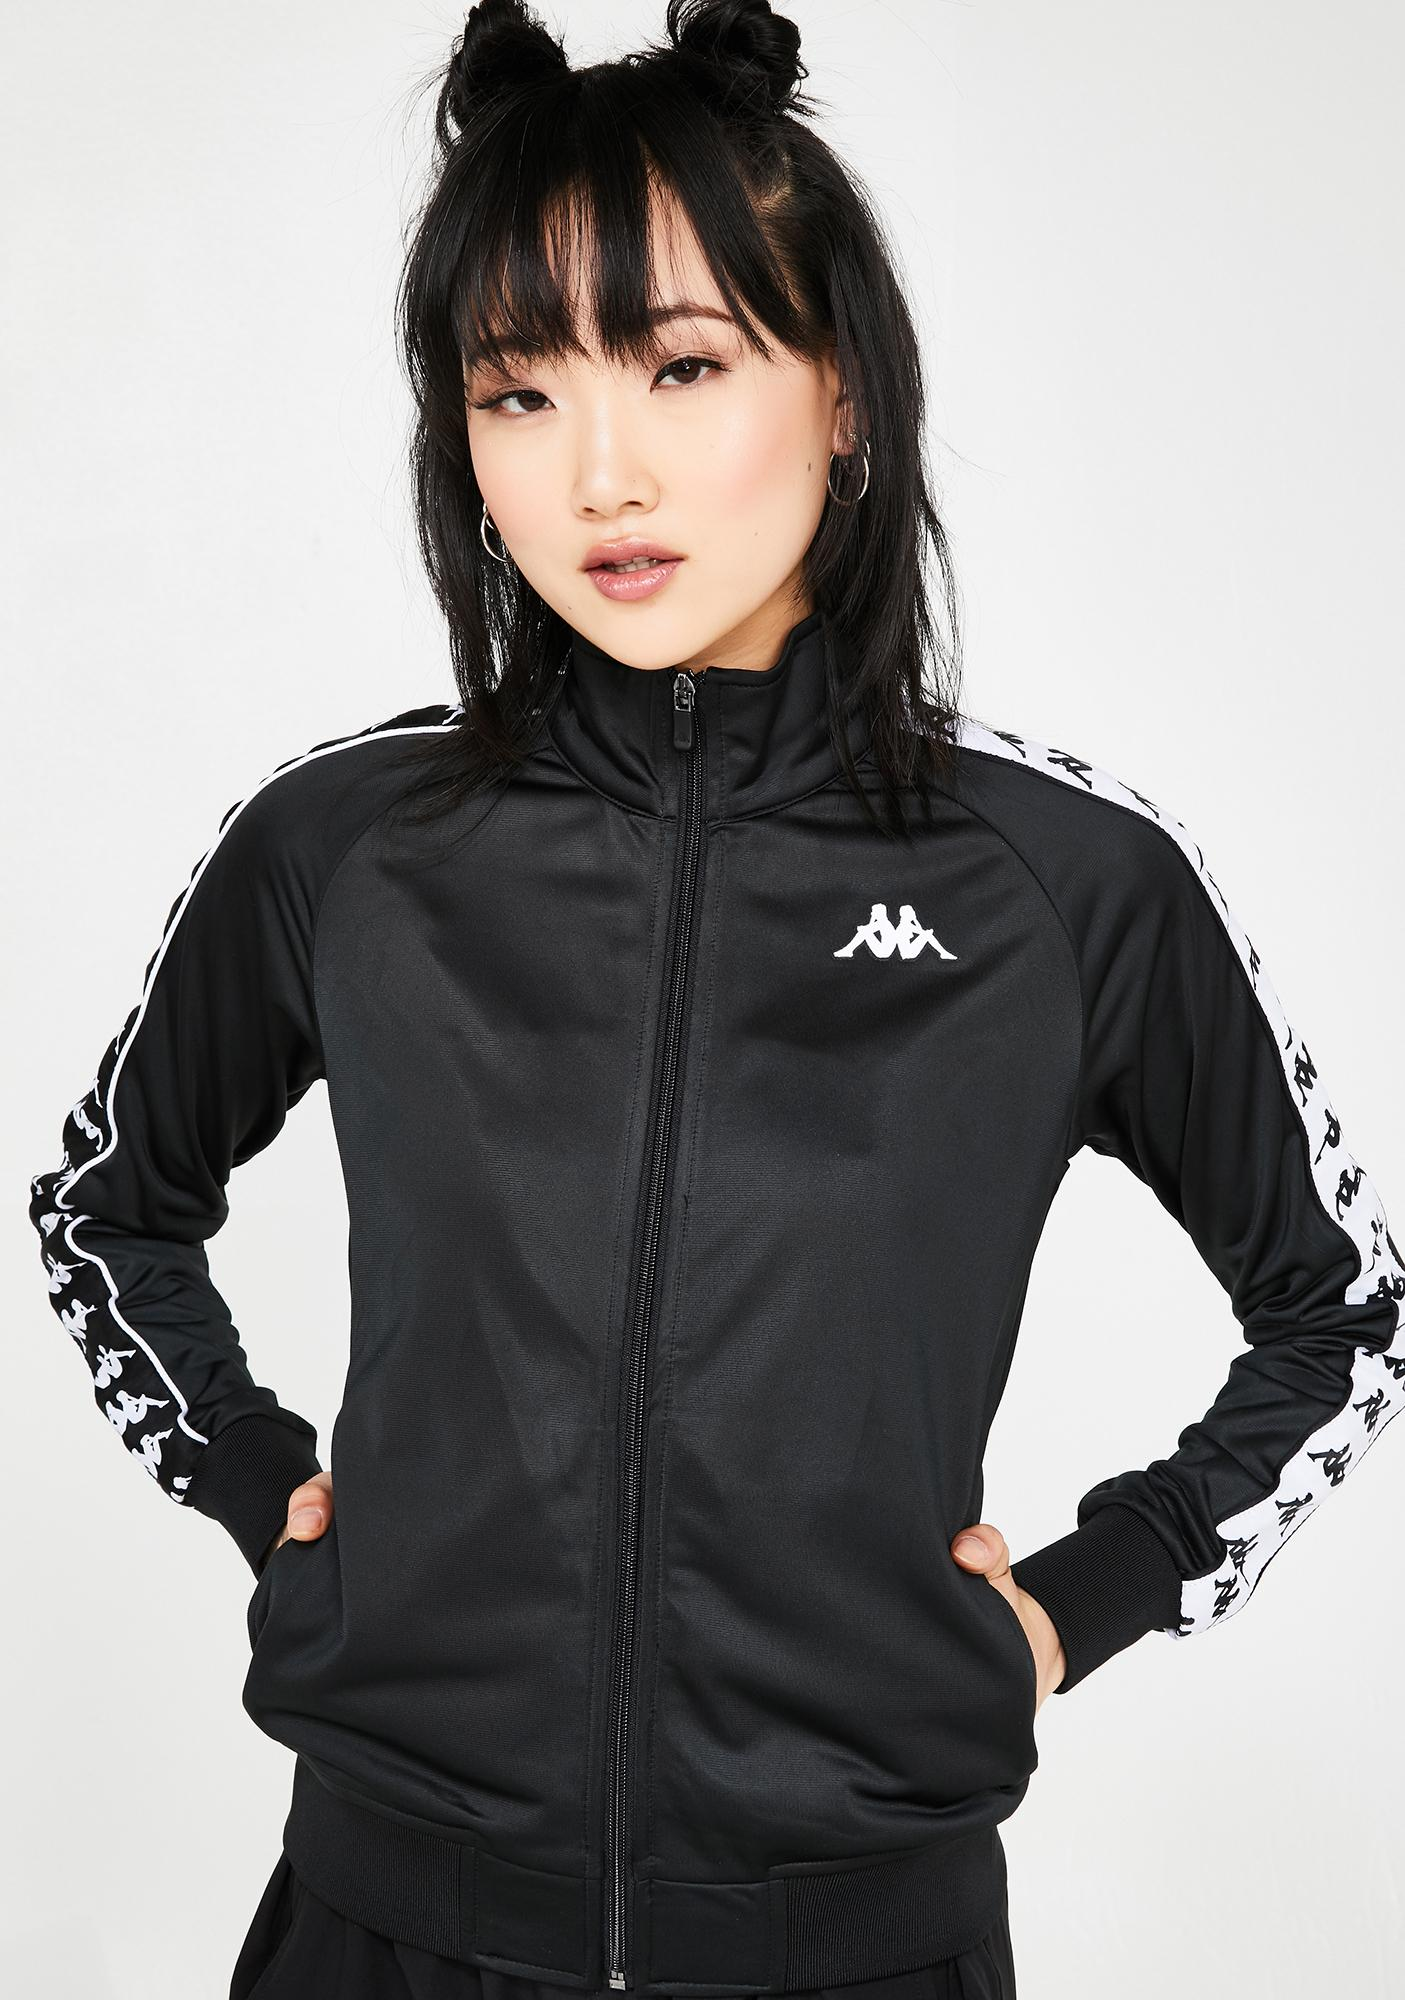 8671104aa7 Onyx 222 Banda Wanniston Slim Jacket